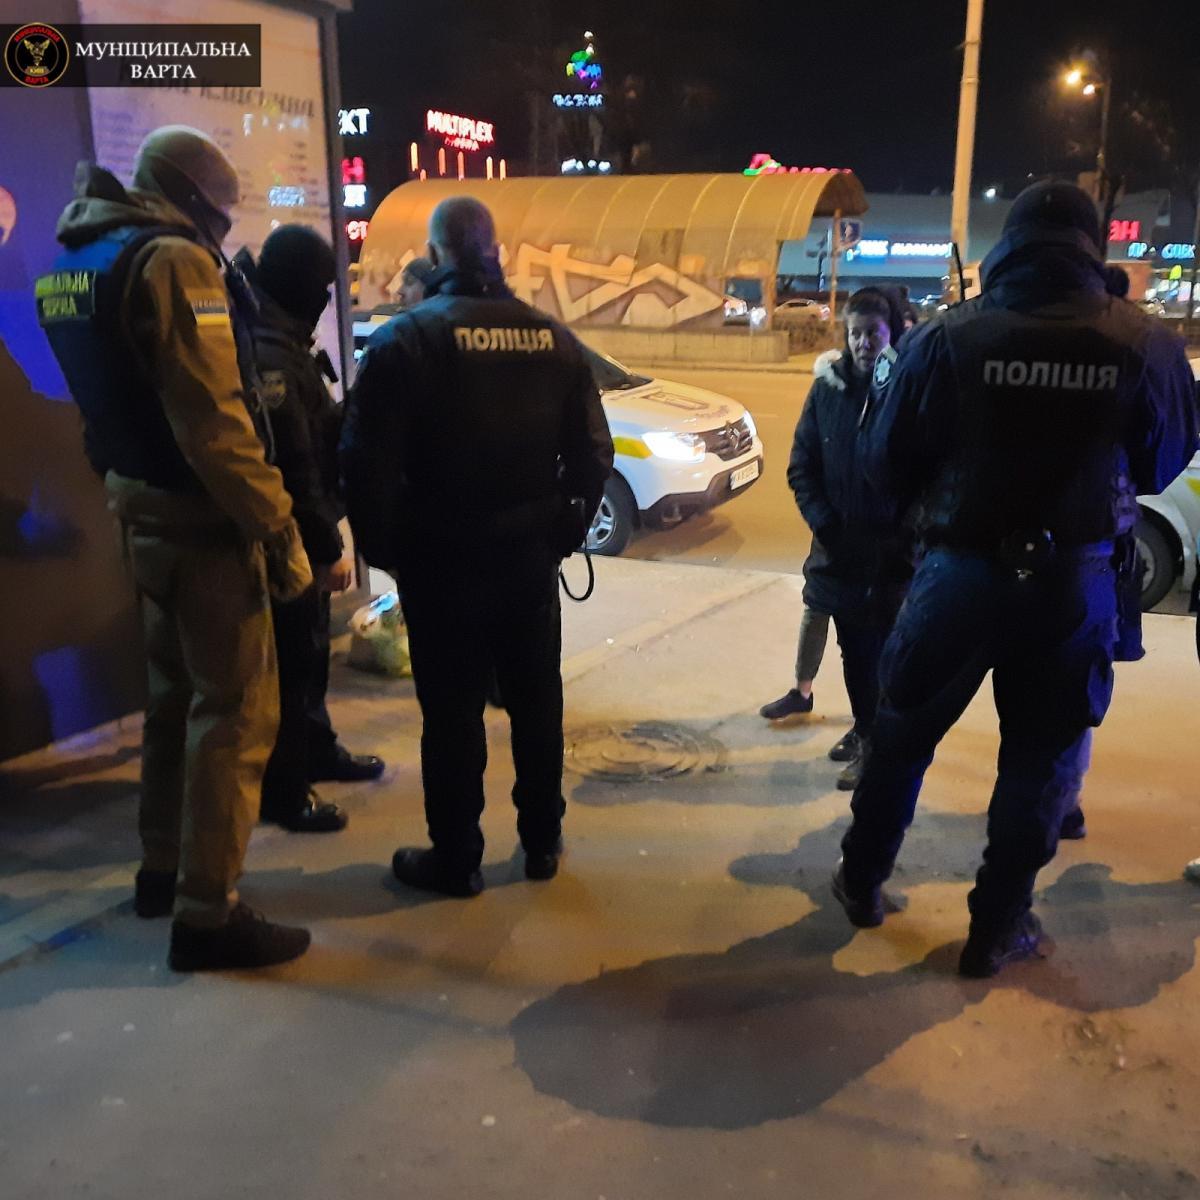 На место приехали правоохранители / фото: facebook.com/MunicipalnaVarta